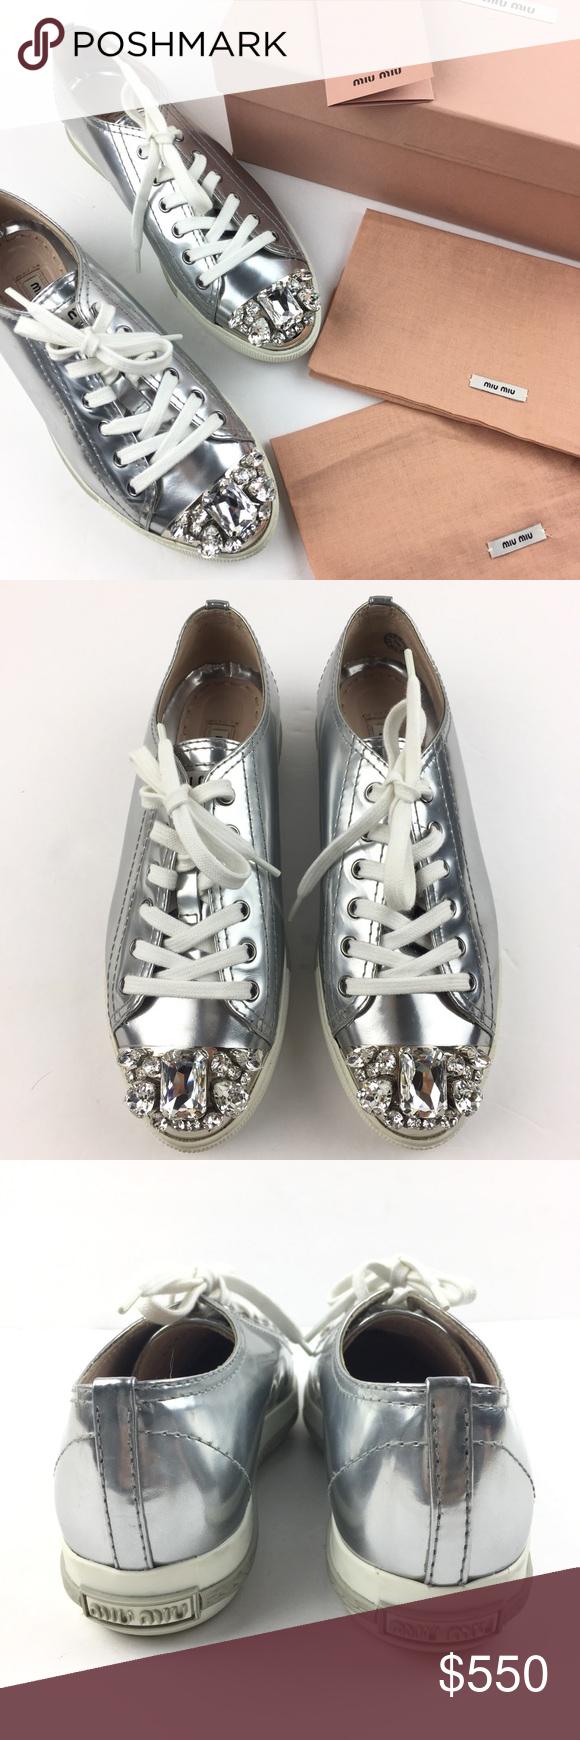 a11068c7b9b Miu Miu Silver Crystal Swarovski Leather Sneakers Authentic Miu Miu Cap Toe Swarovski  Crystal Metallic Silver Patent Leathe Sneakes.